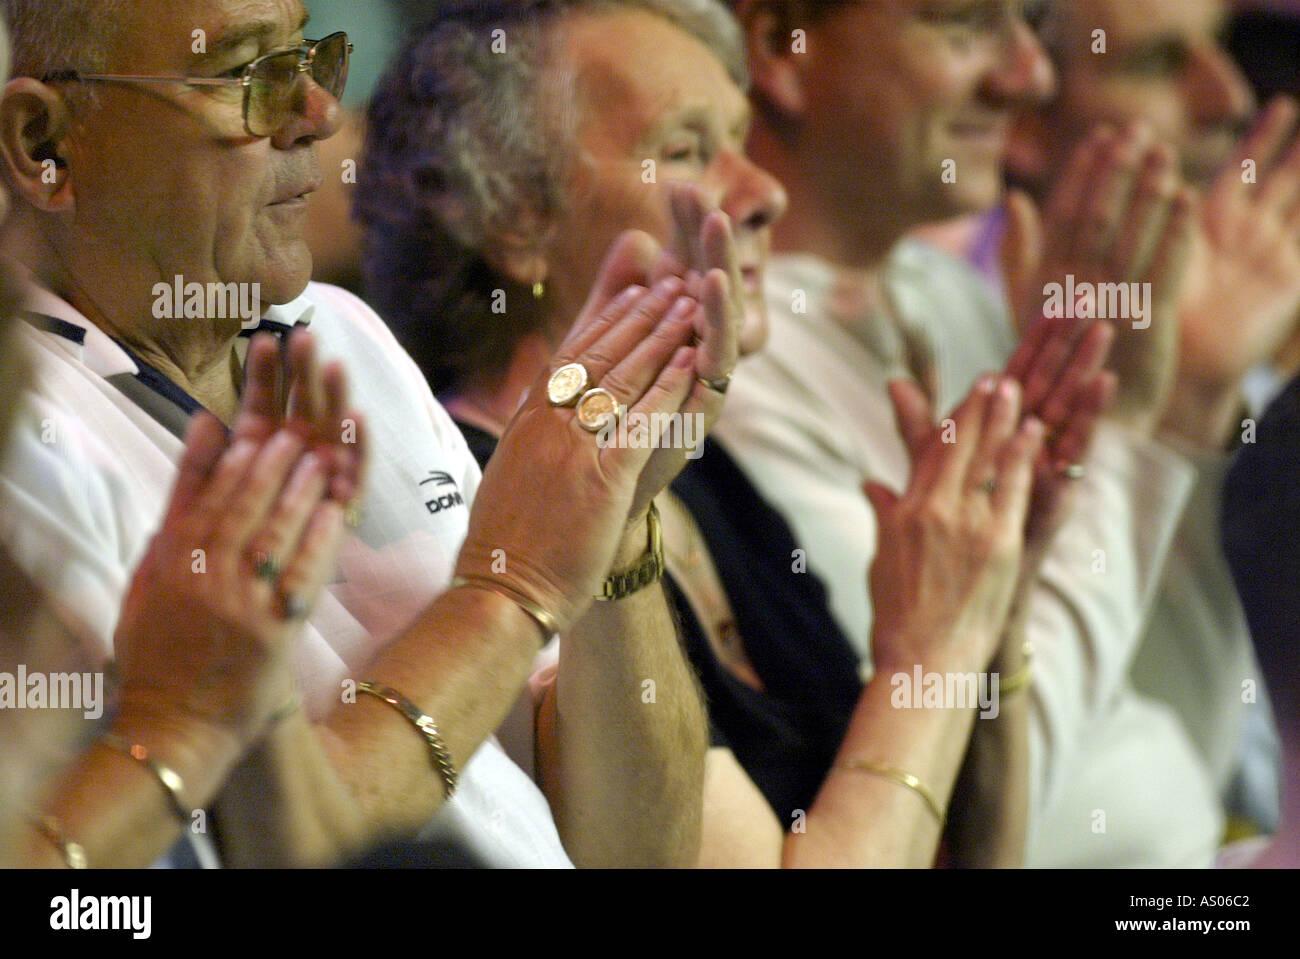 Audience applauding - Stock Image